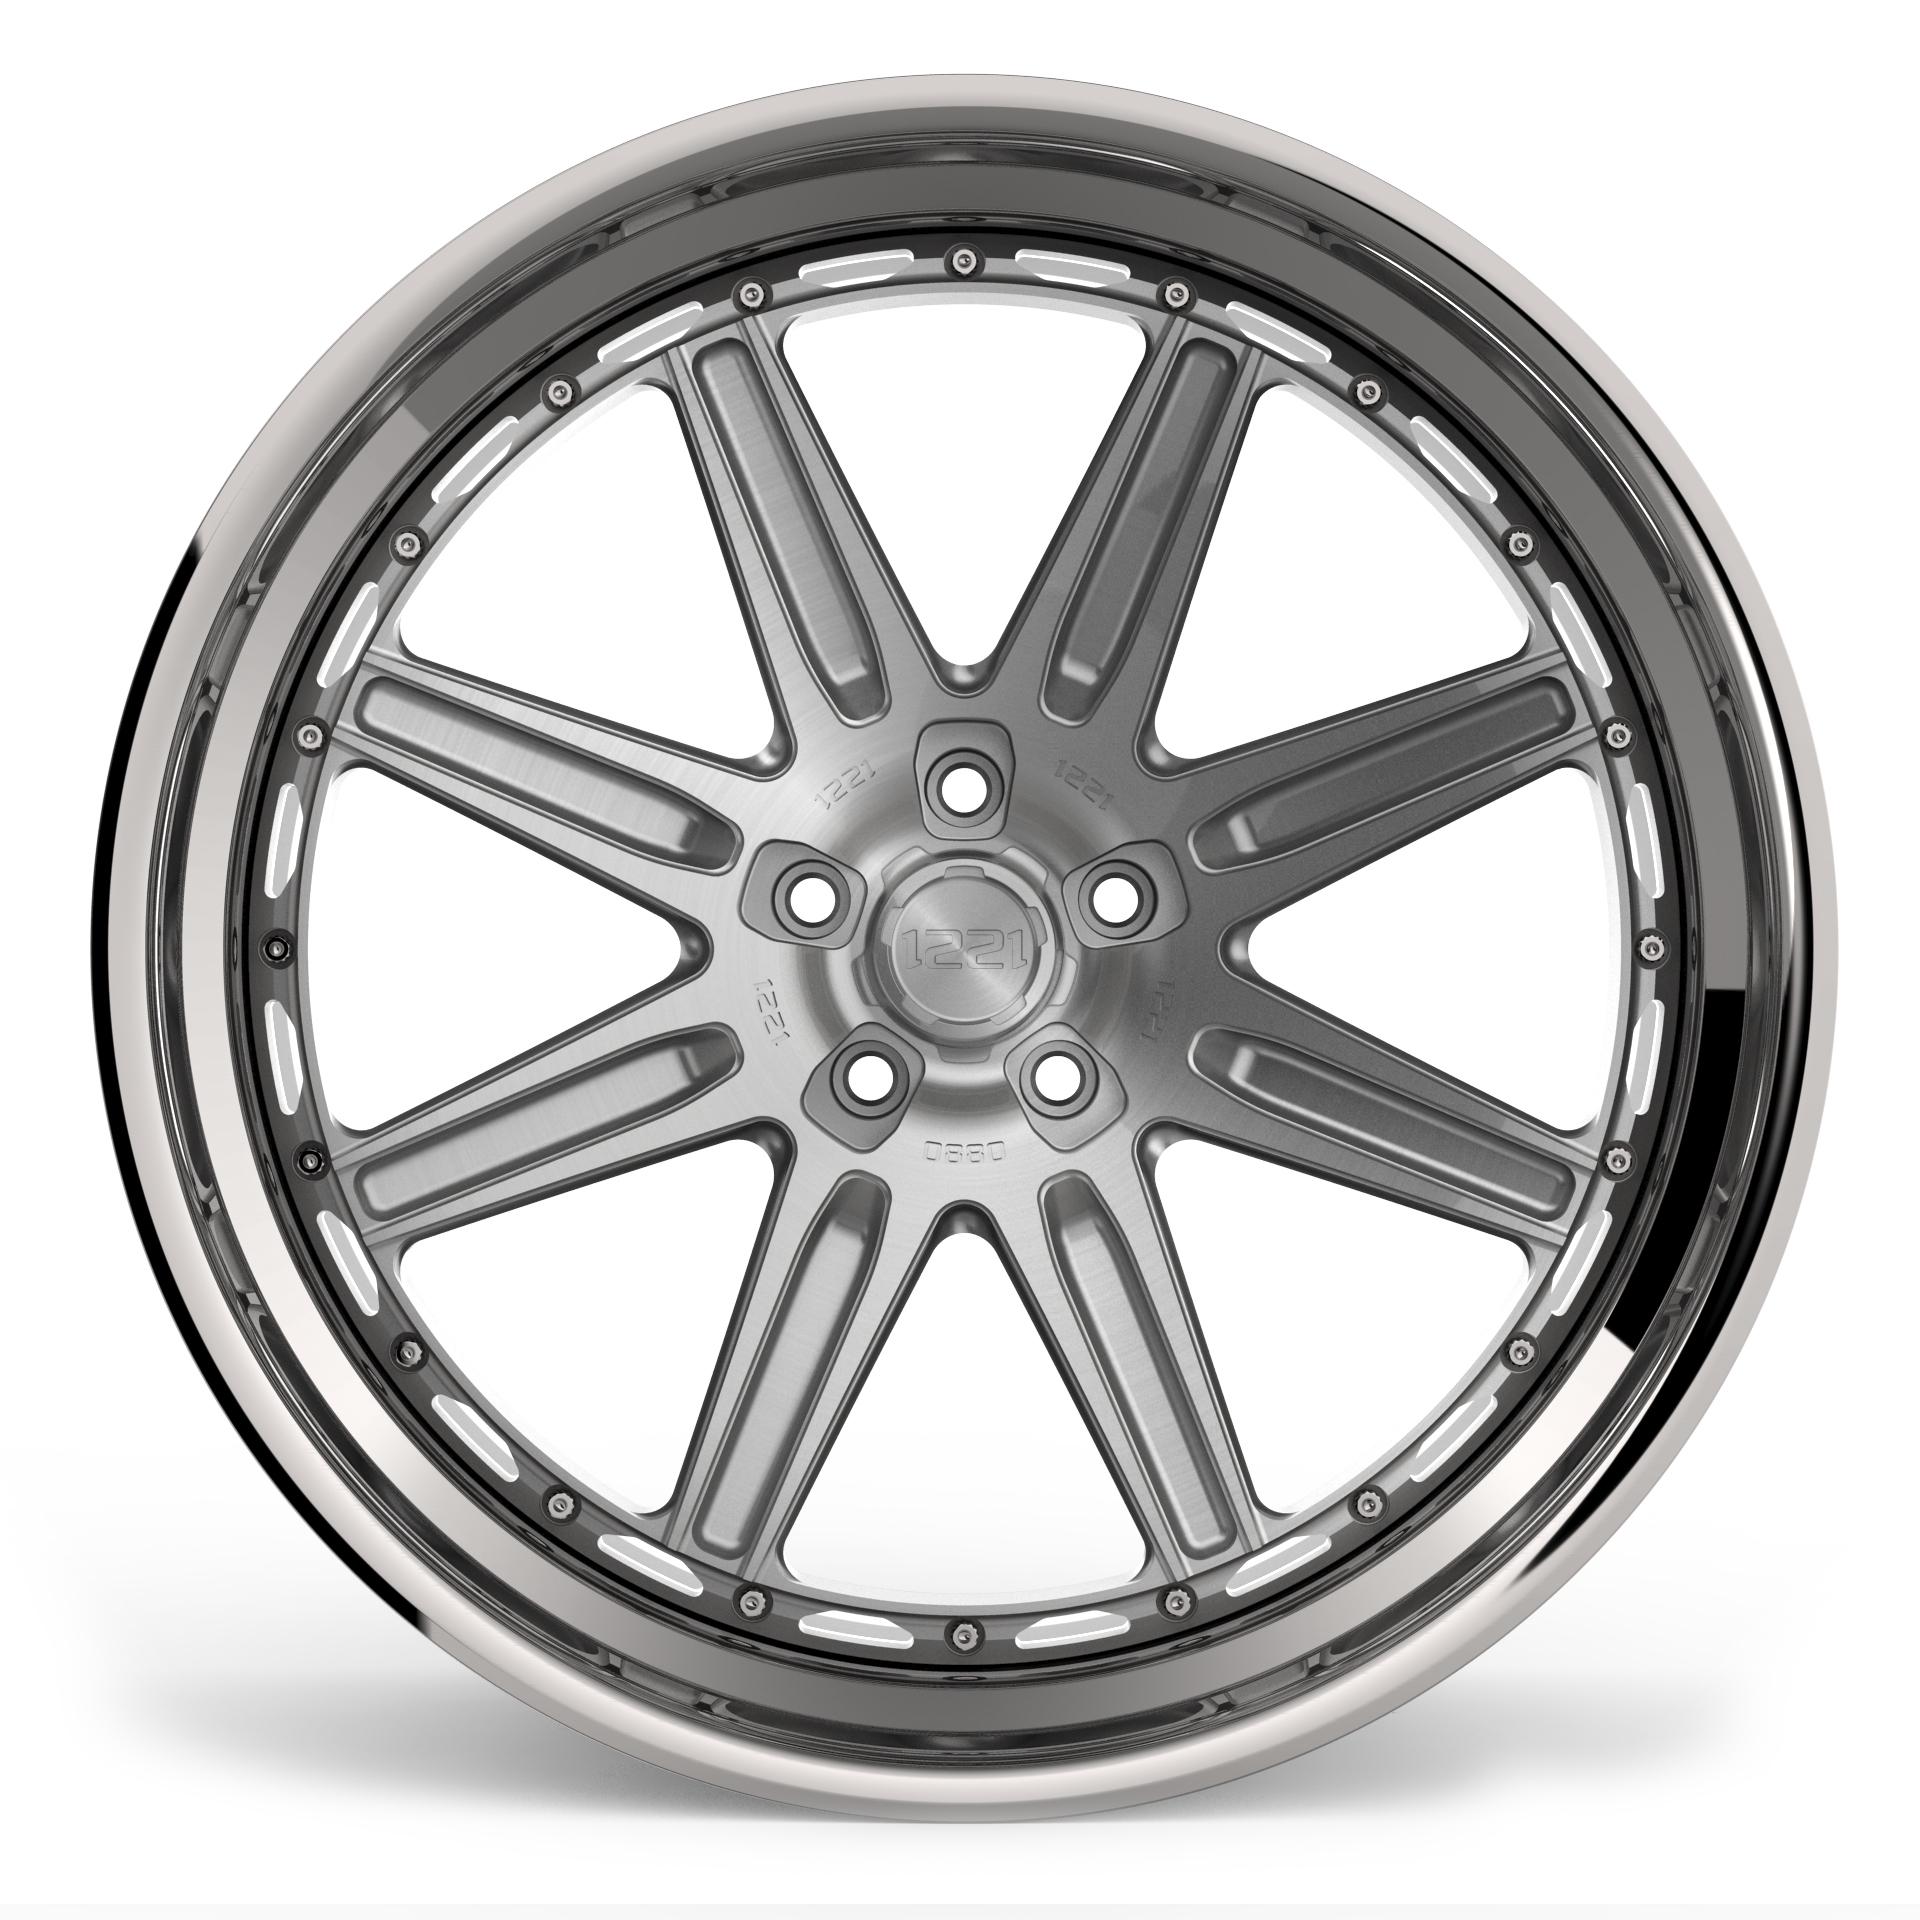 1221 Wheels 0880 AP3X APEX3.0 forged wheels